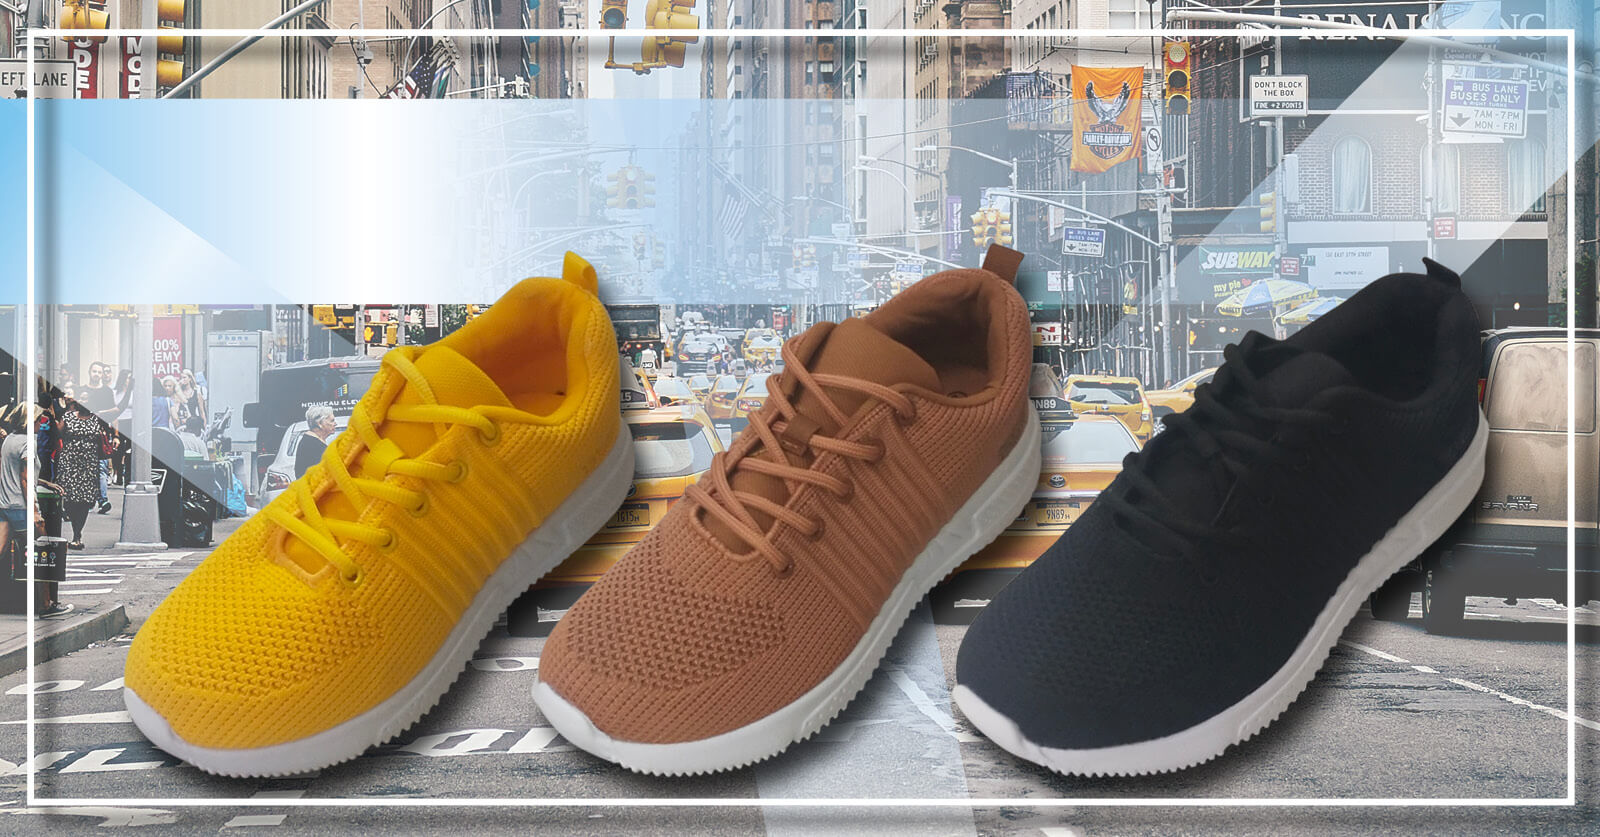 Bali sneakers sko gul brun svart city gate